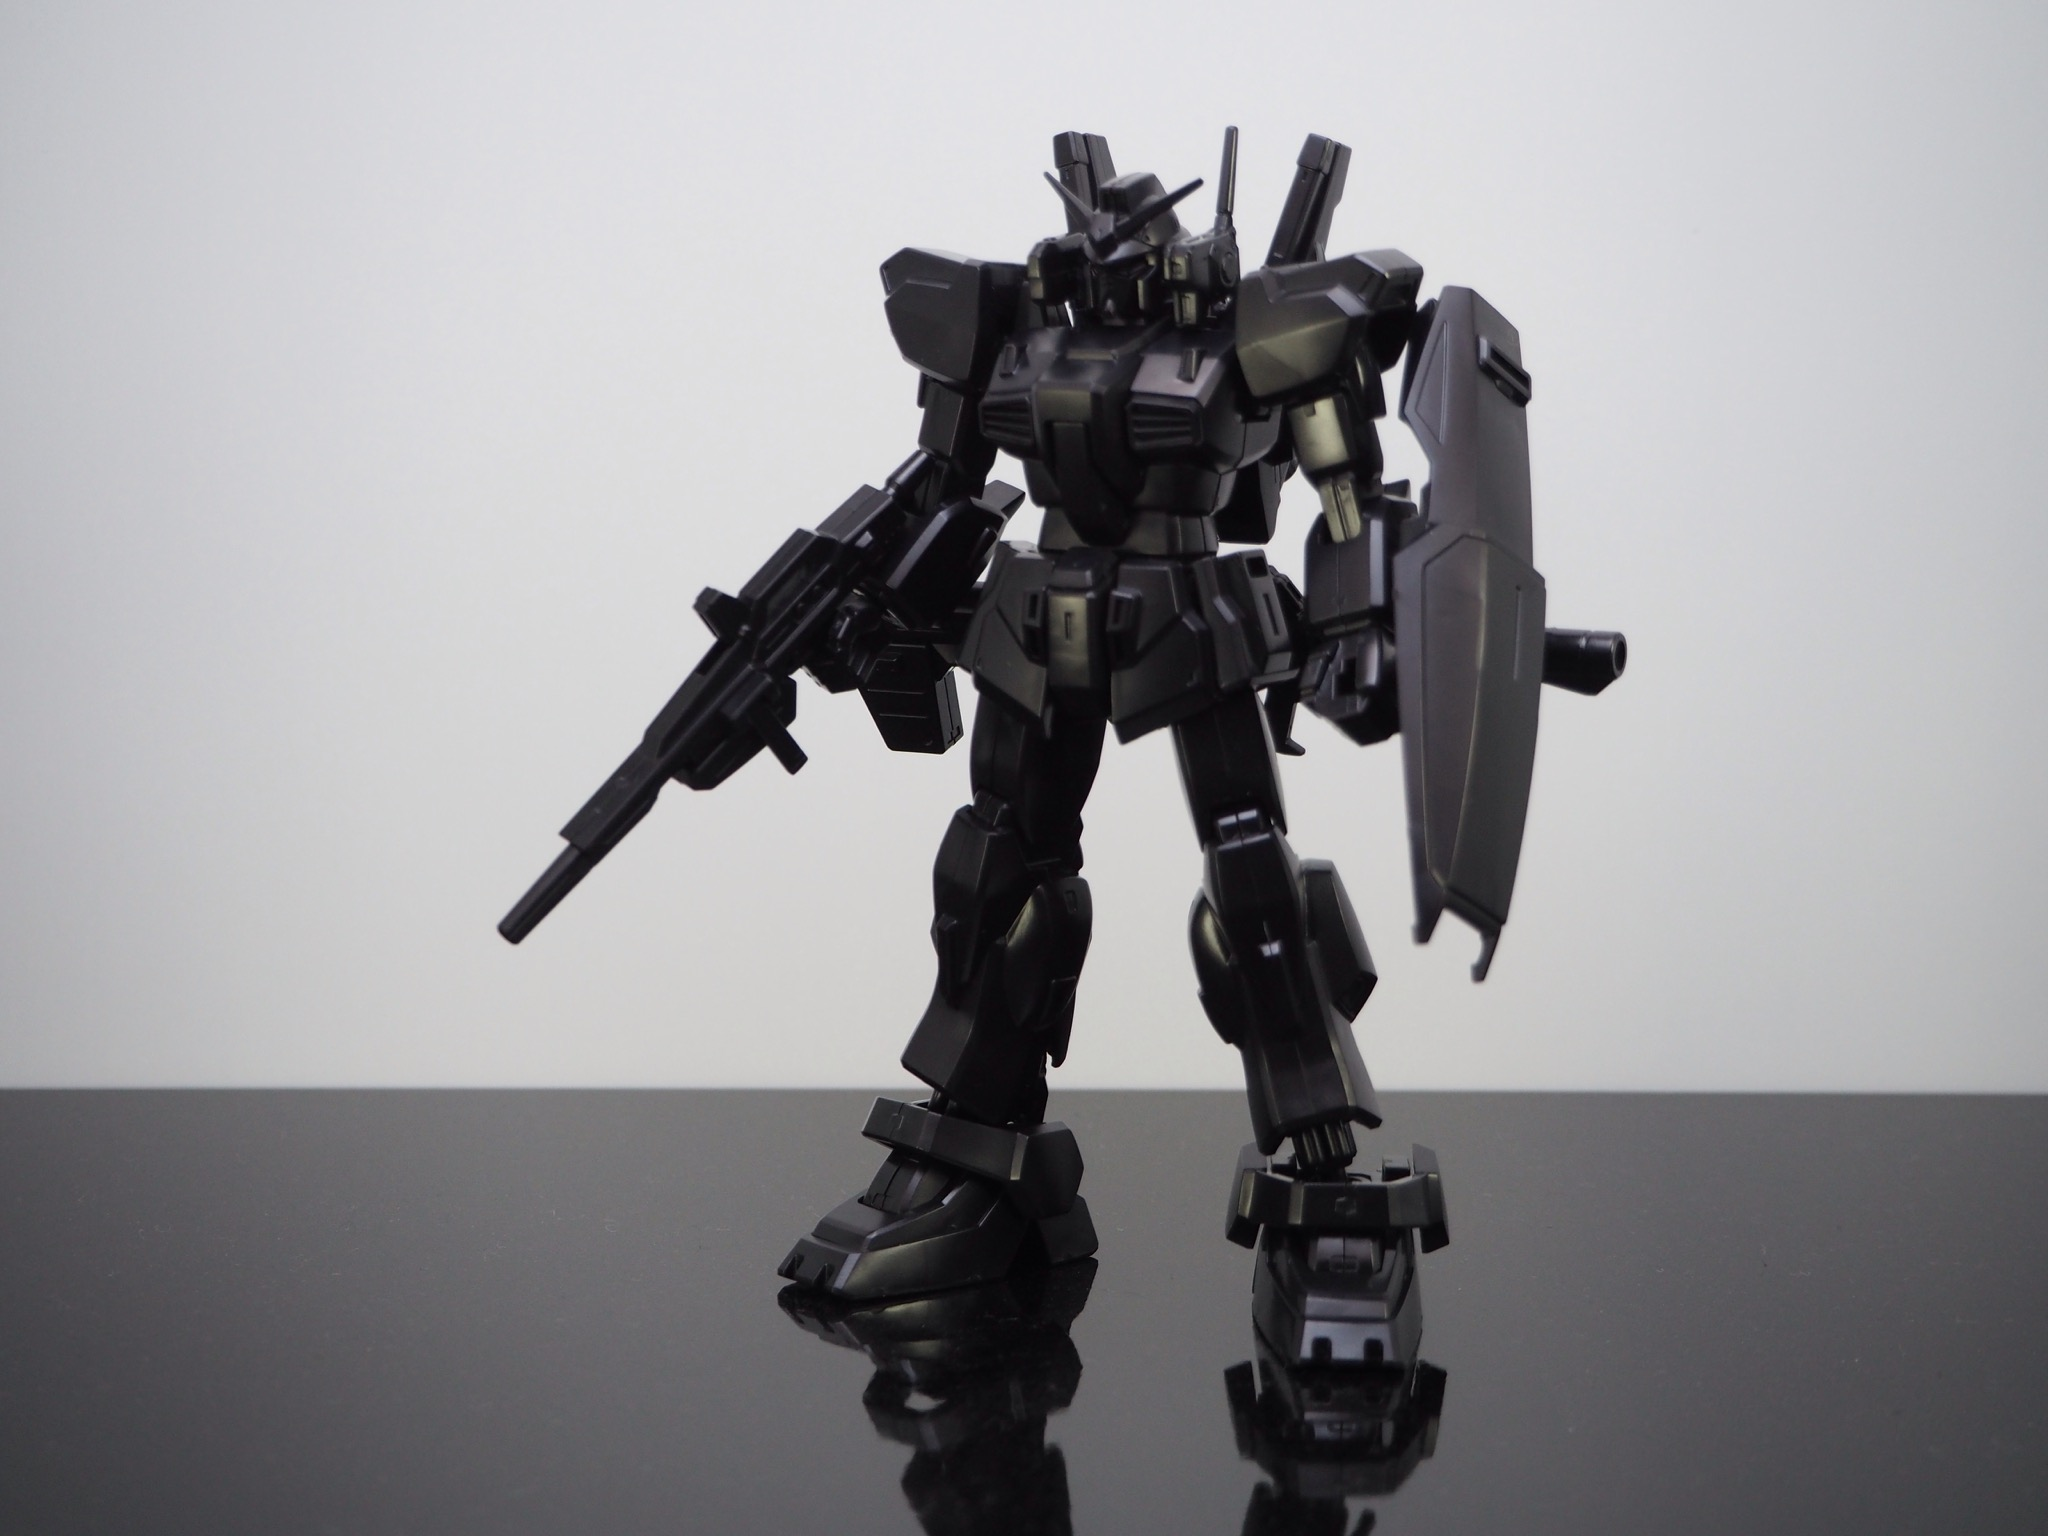 HGUC 1/144 RX-178 エコプラ ガンダムMk-II [ECOPLA GUNDAM Mk-II]